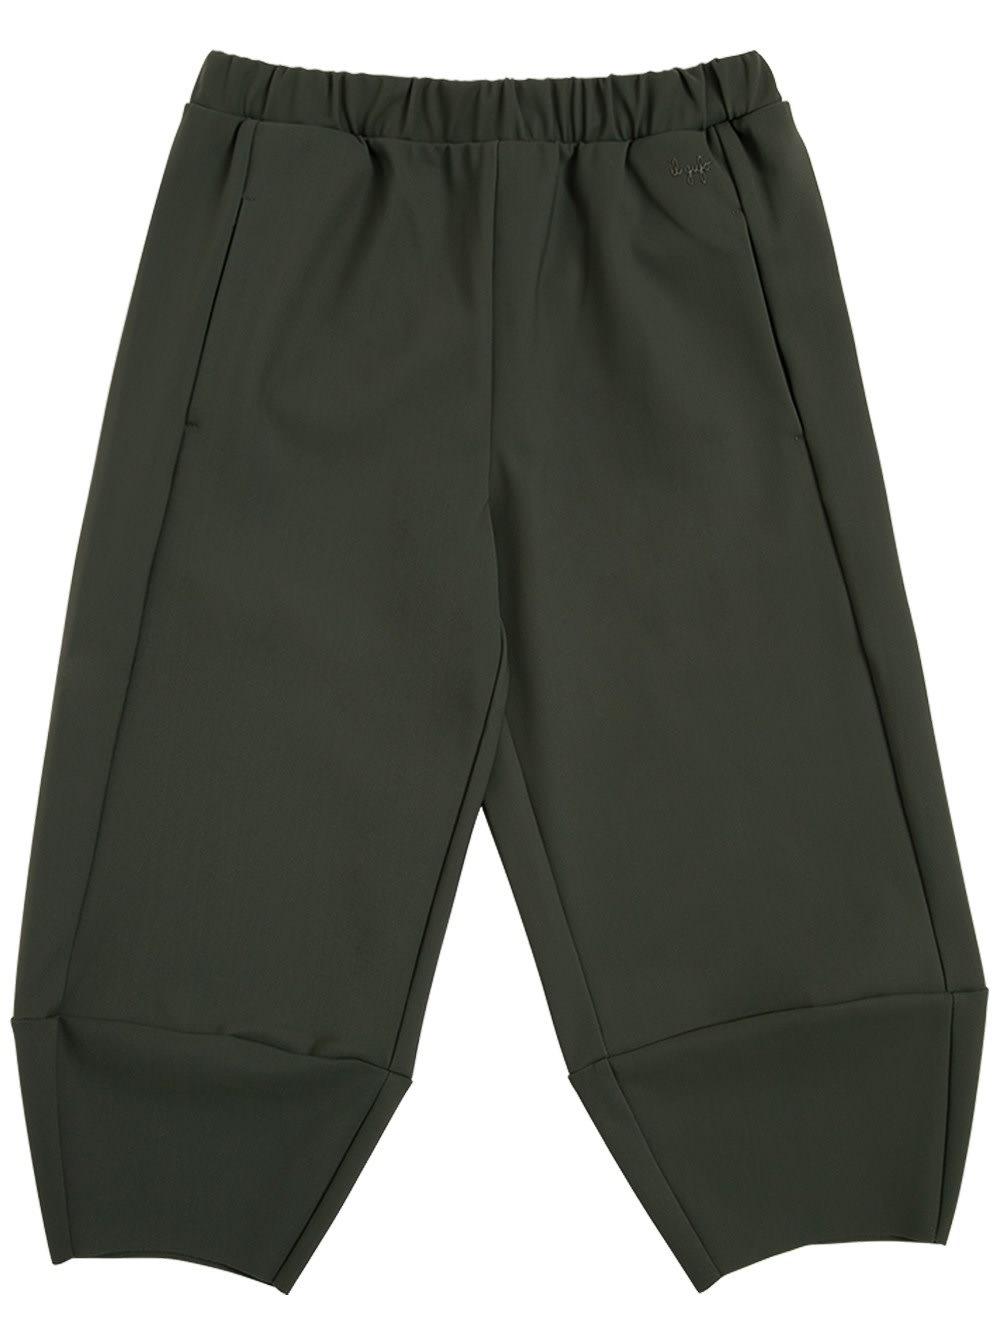 Green Sensitive Fabrics Jogger Pants